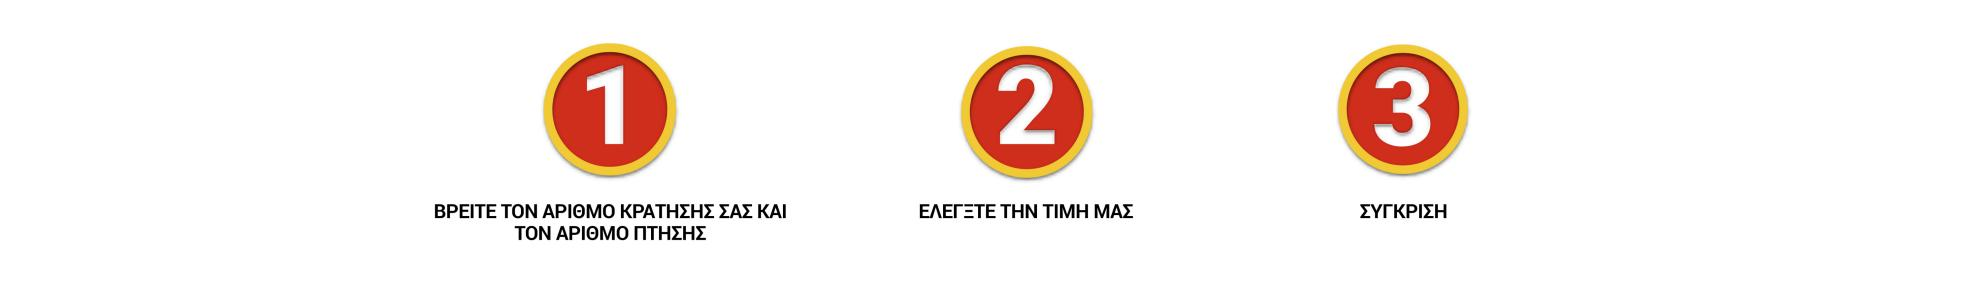 banner.image.altText